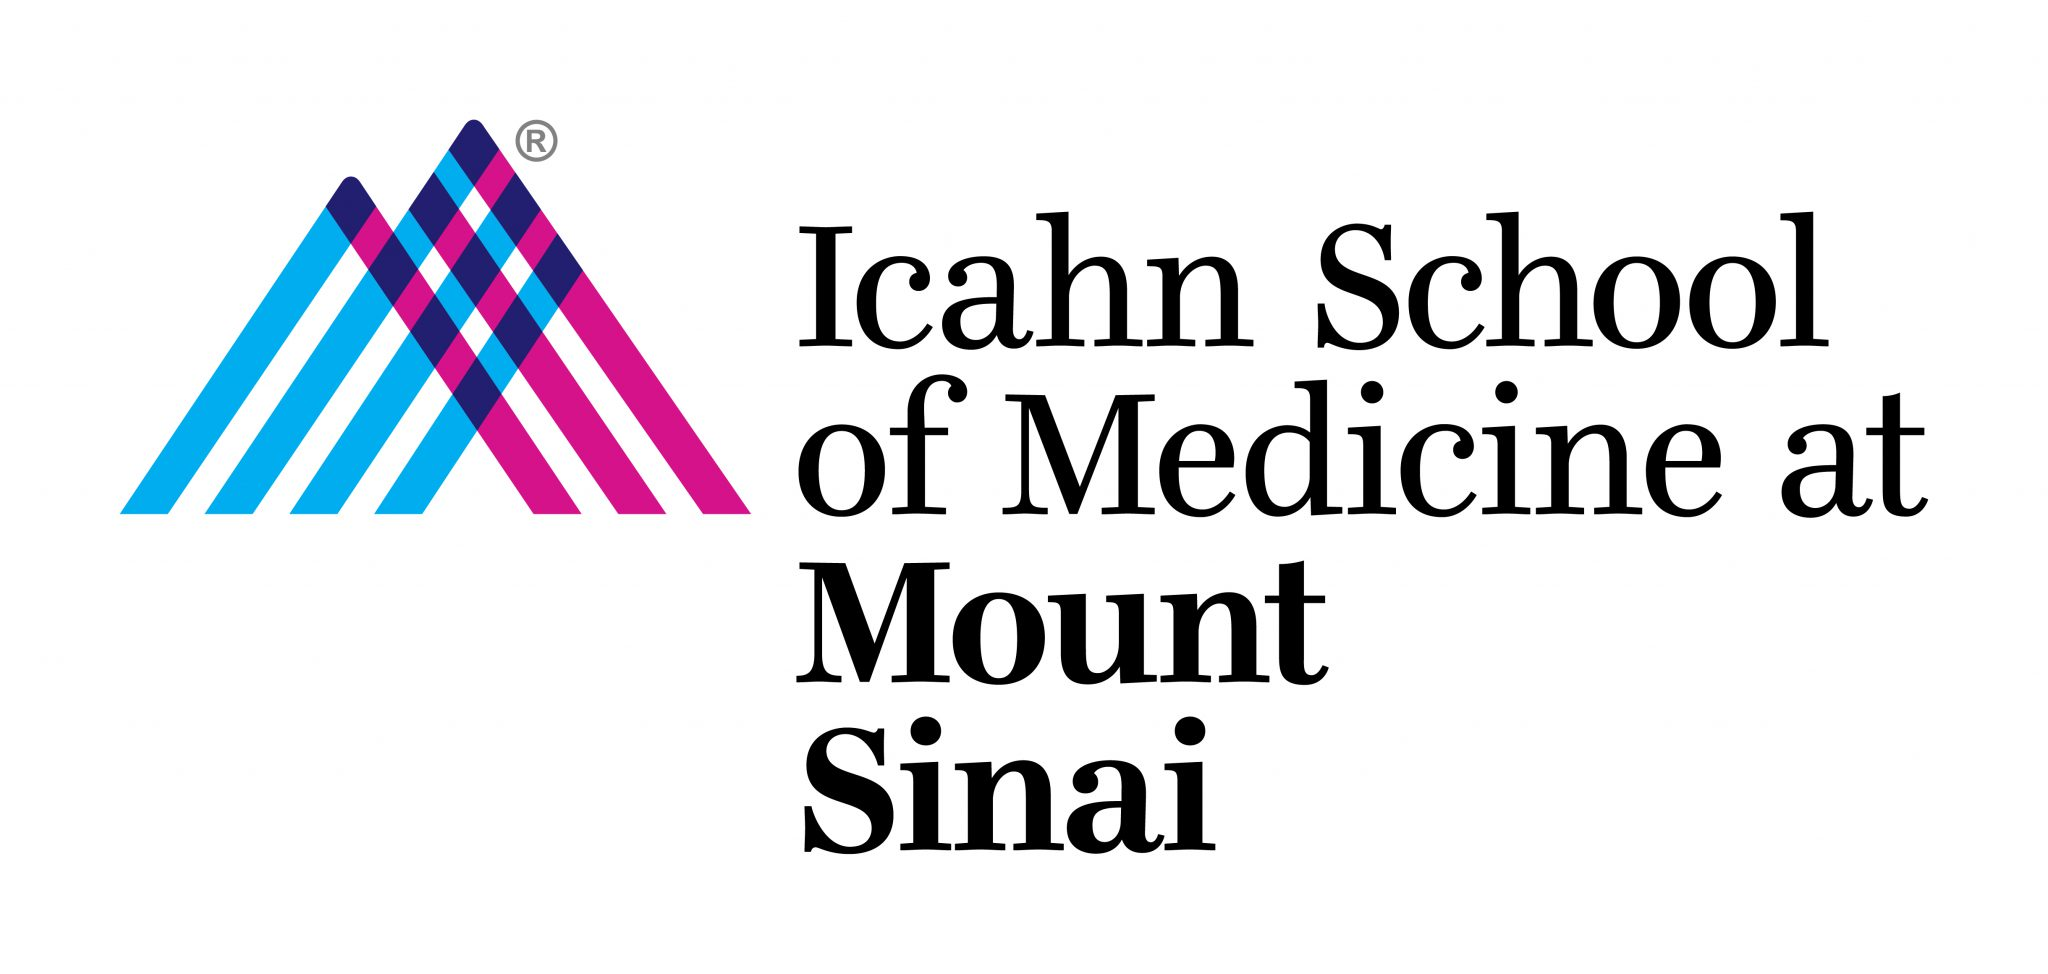 Secondary Essay Prompts - Icahn School of Medicine at Mount